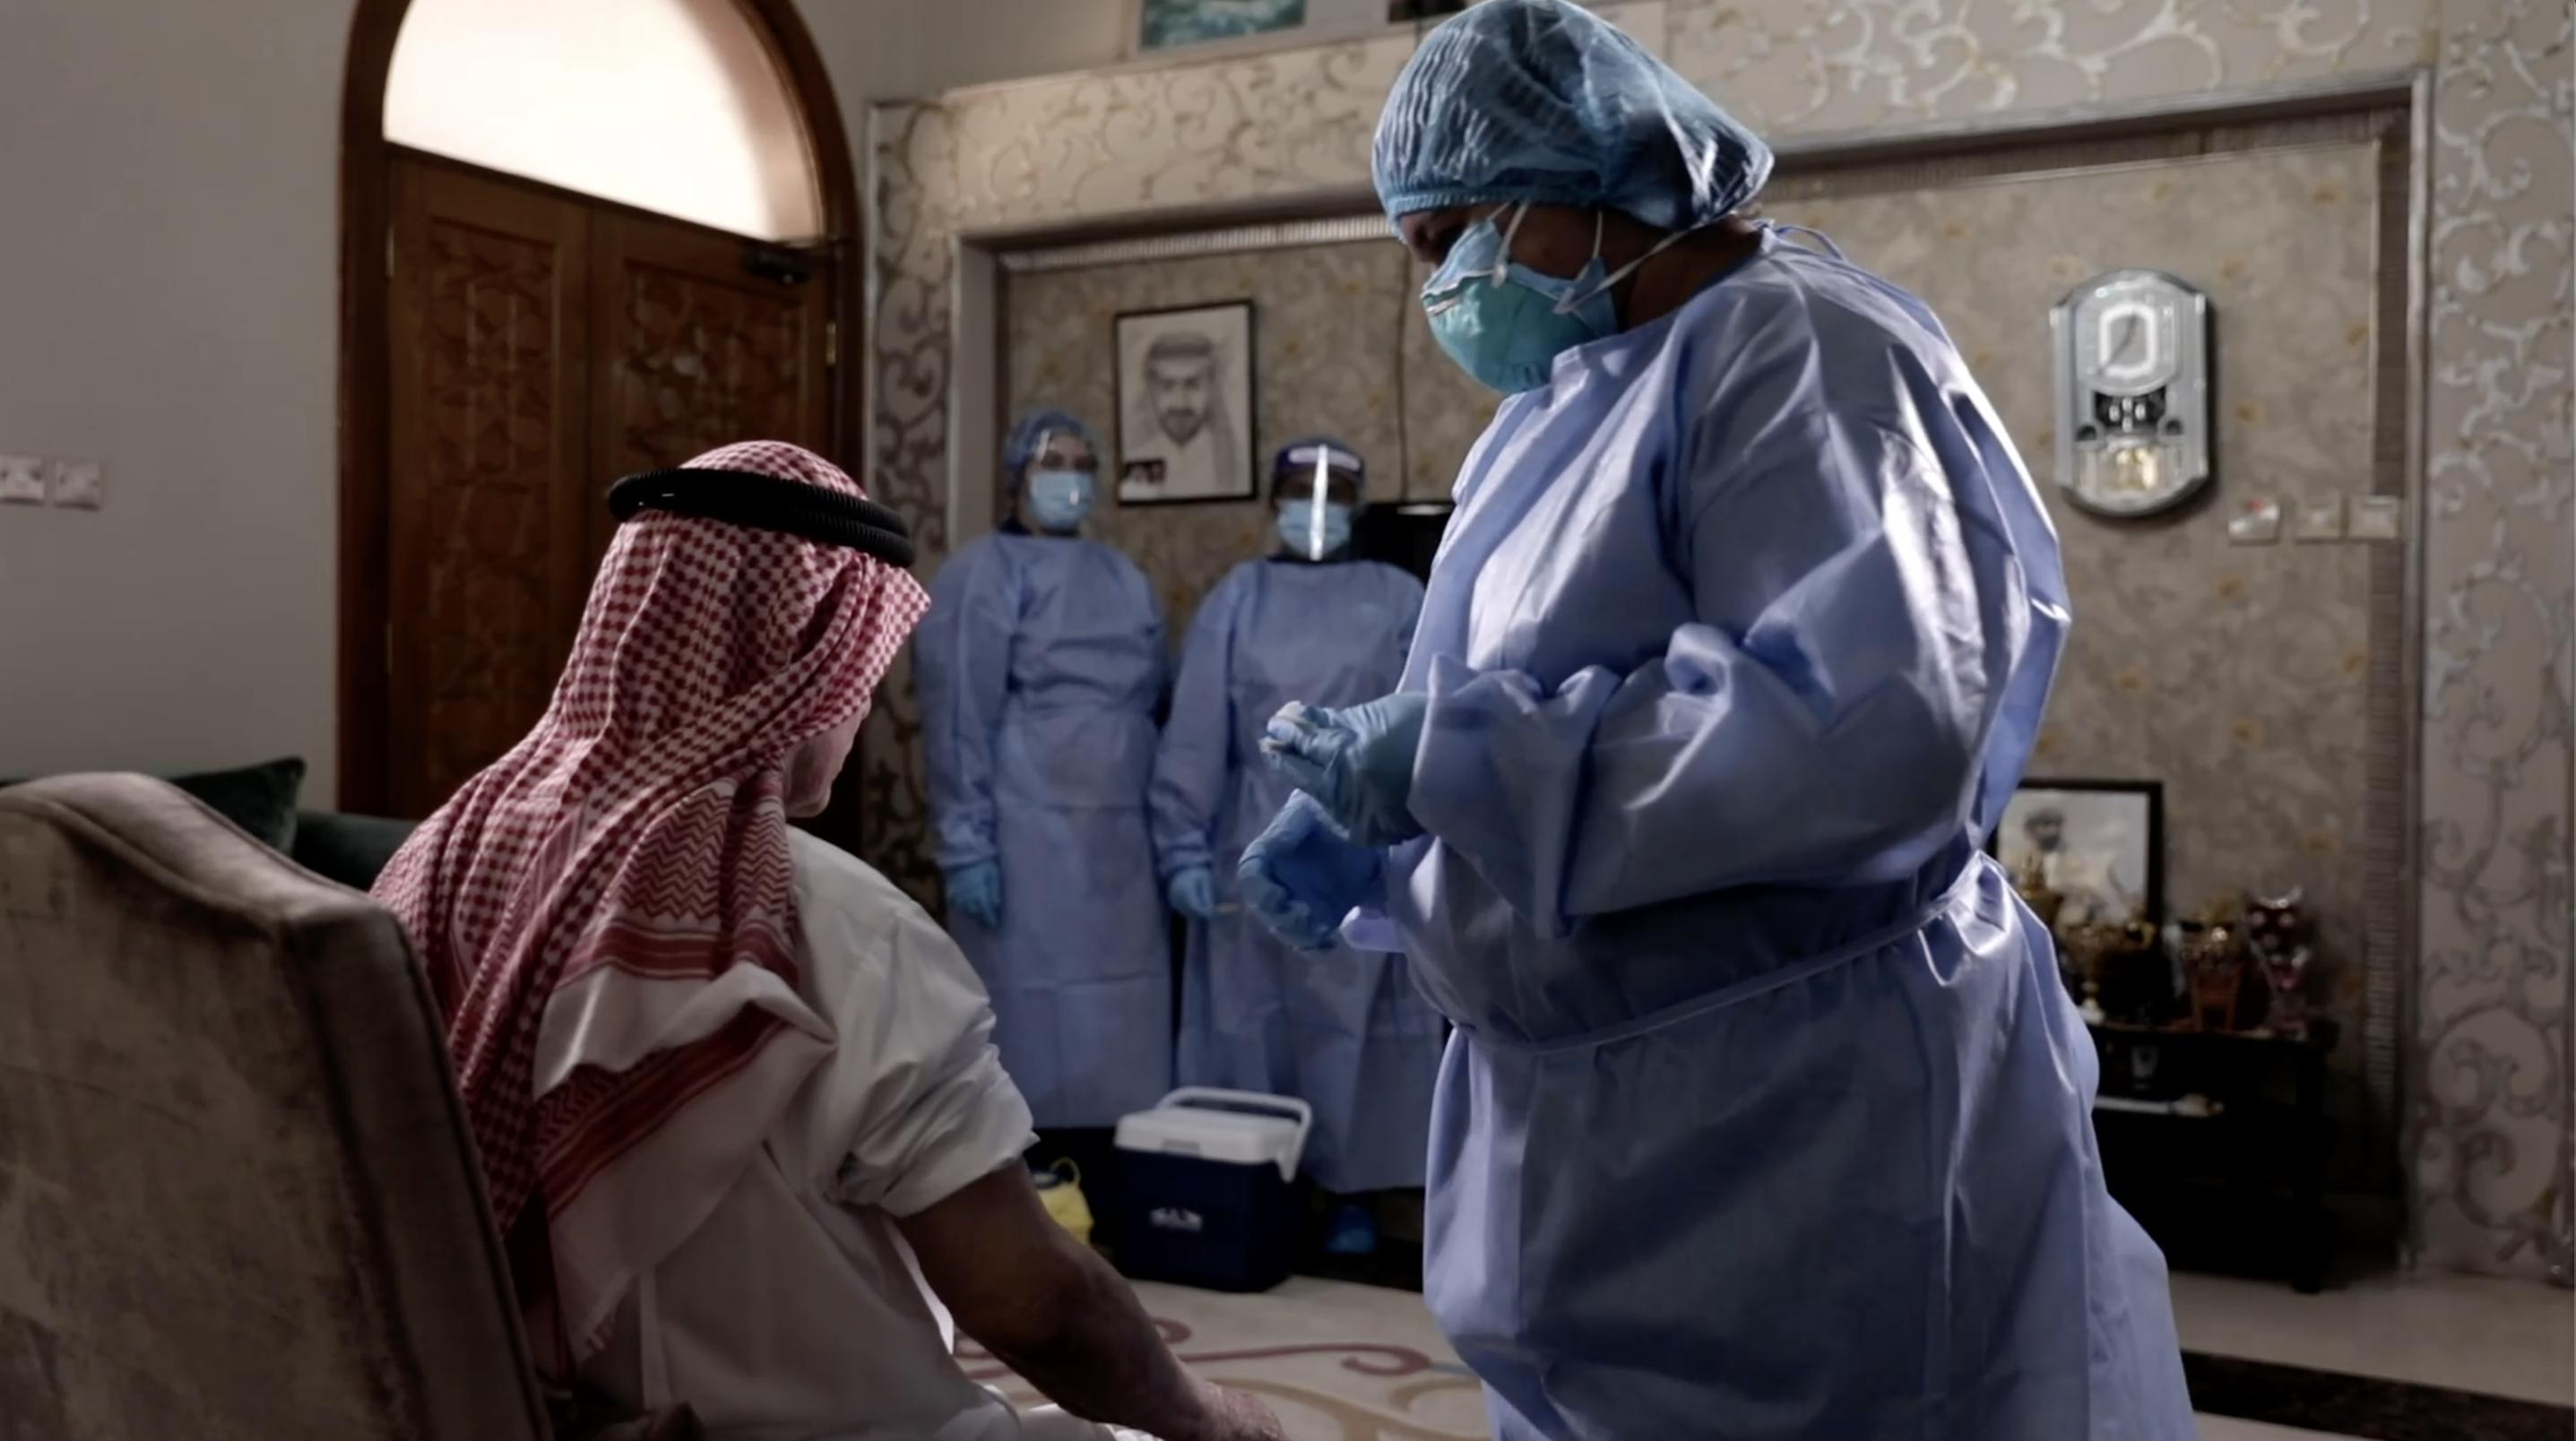 Seniors in Sharjah get flu shots at home